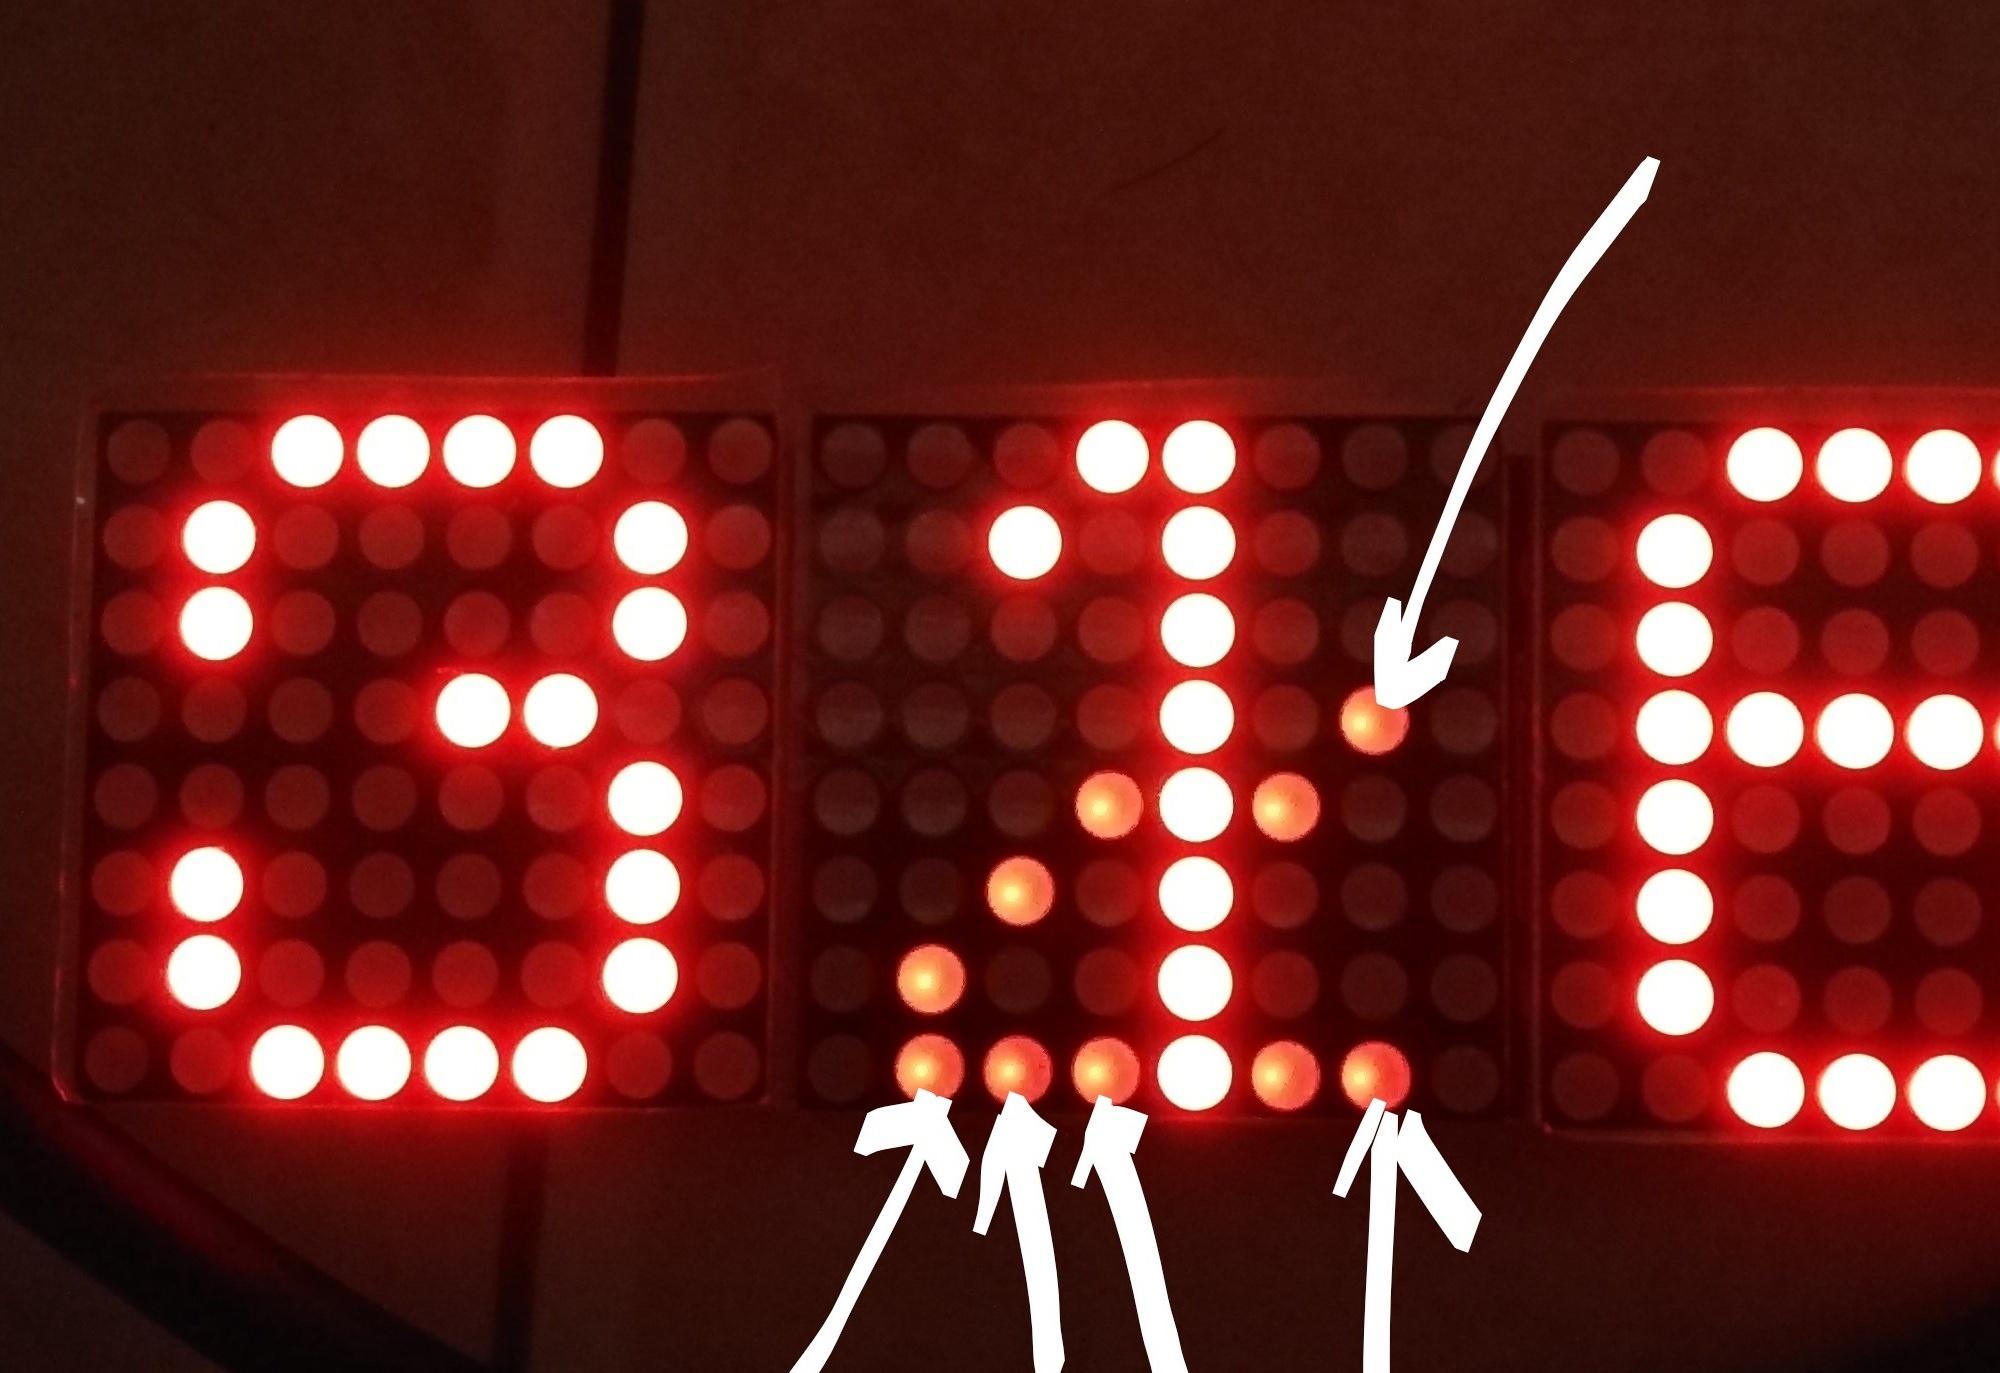 MAX7219級聯顯示(shi)時有一(yi)個模(mo)塊總是有閃爍